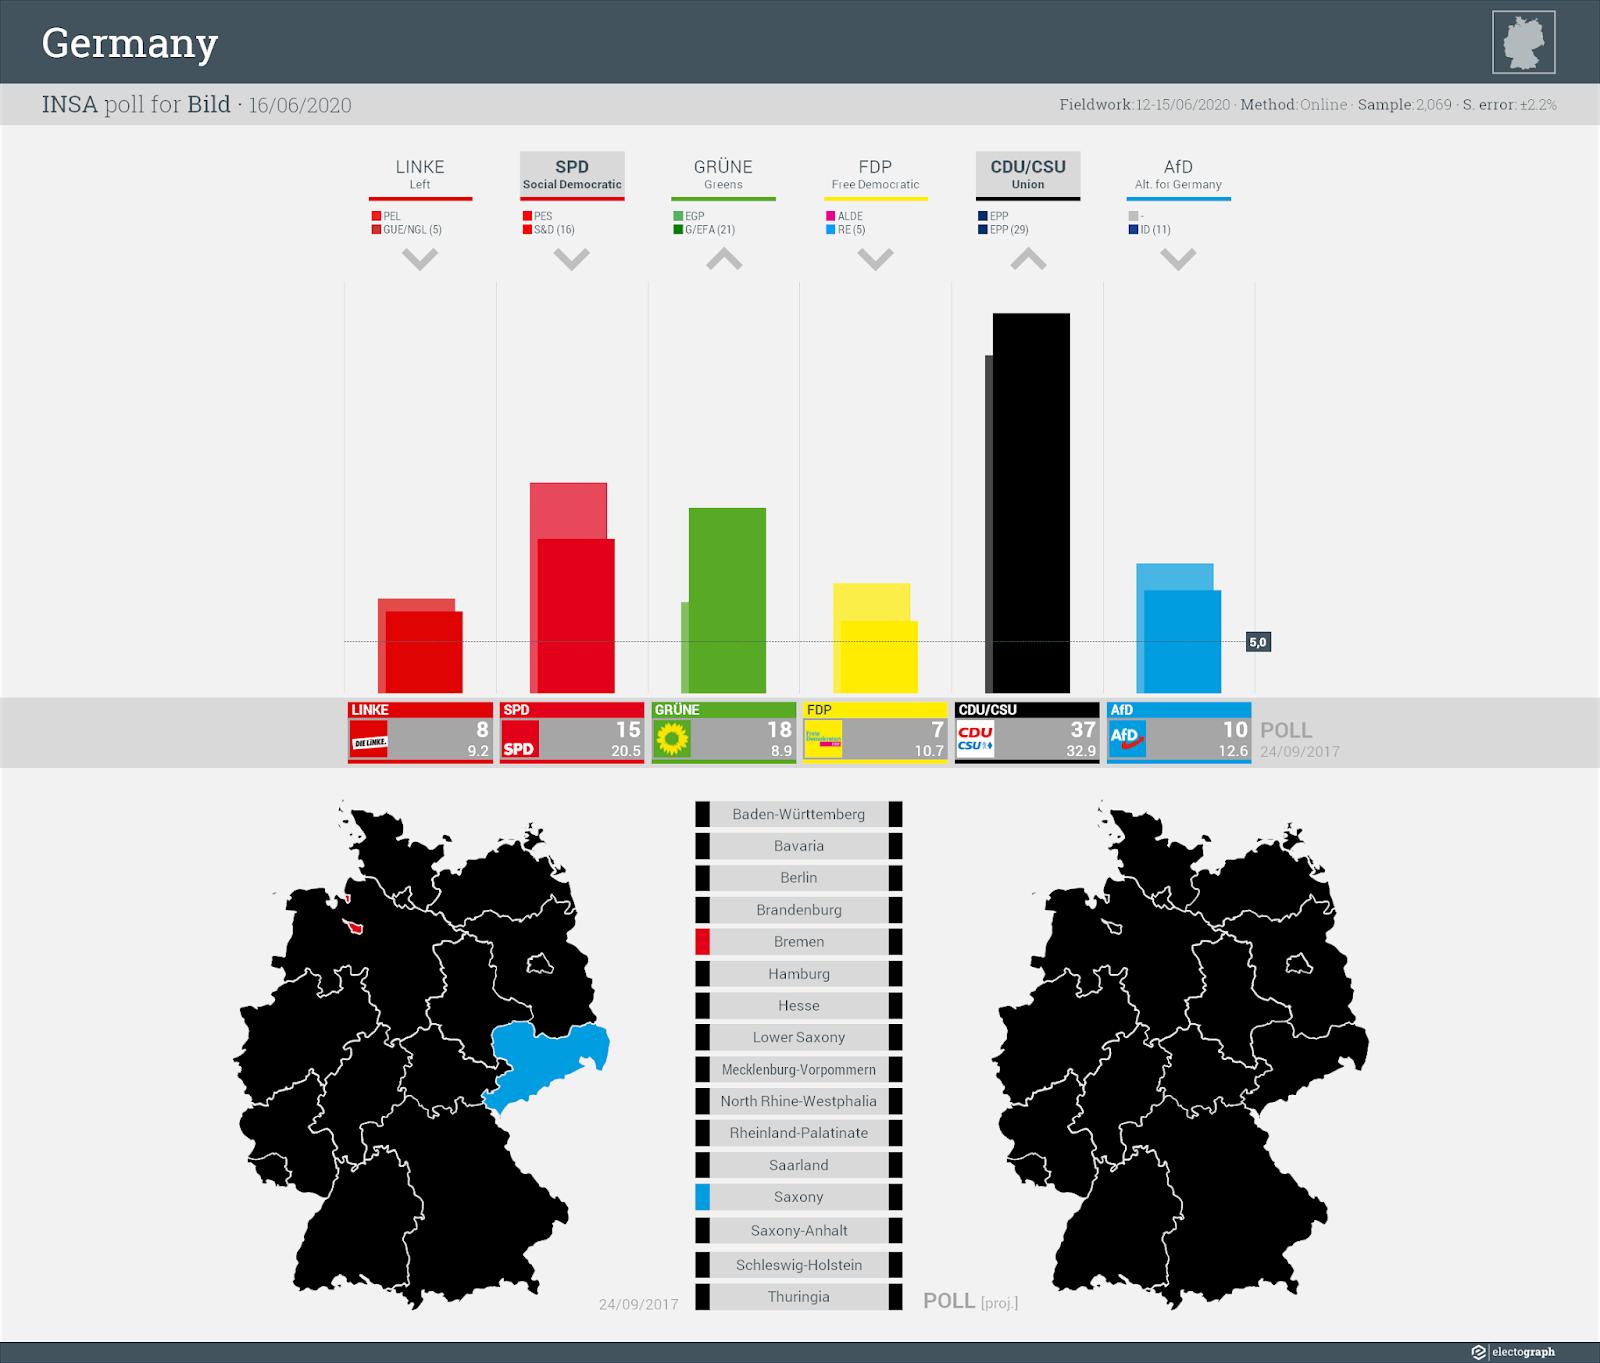 GERMANY: INSA poll chart for Bild, 16 June 2020